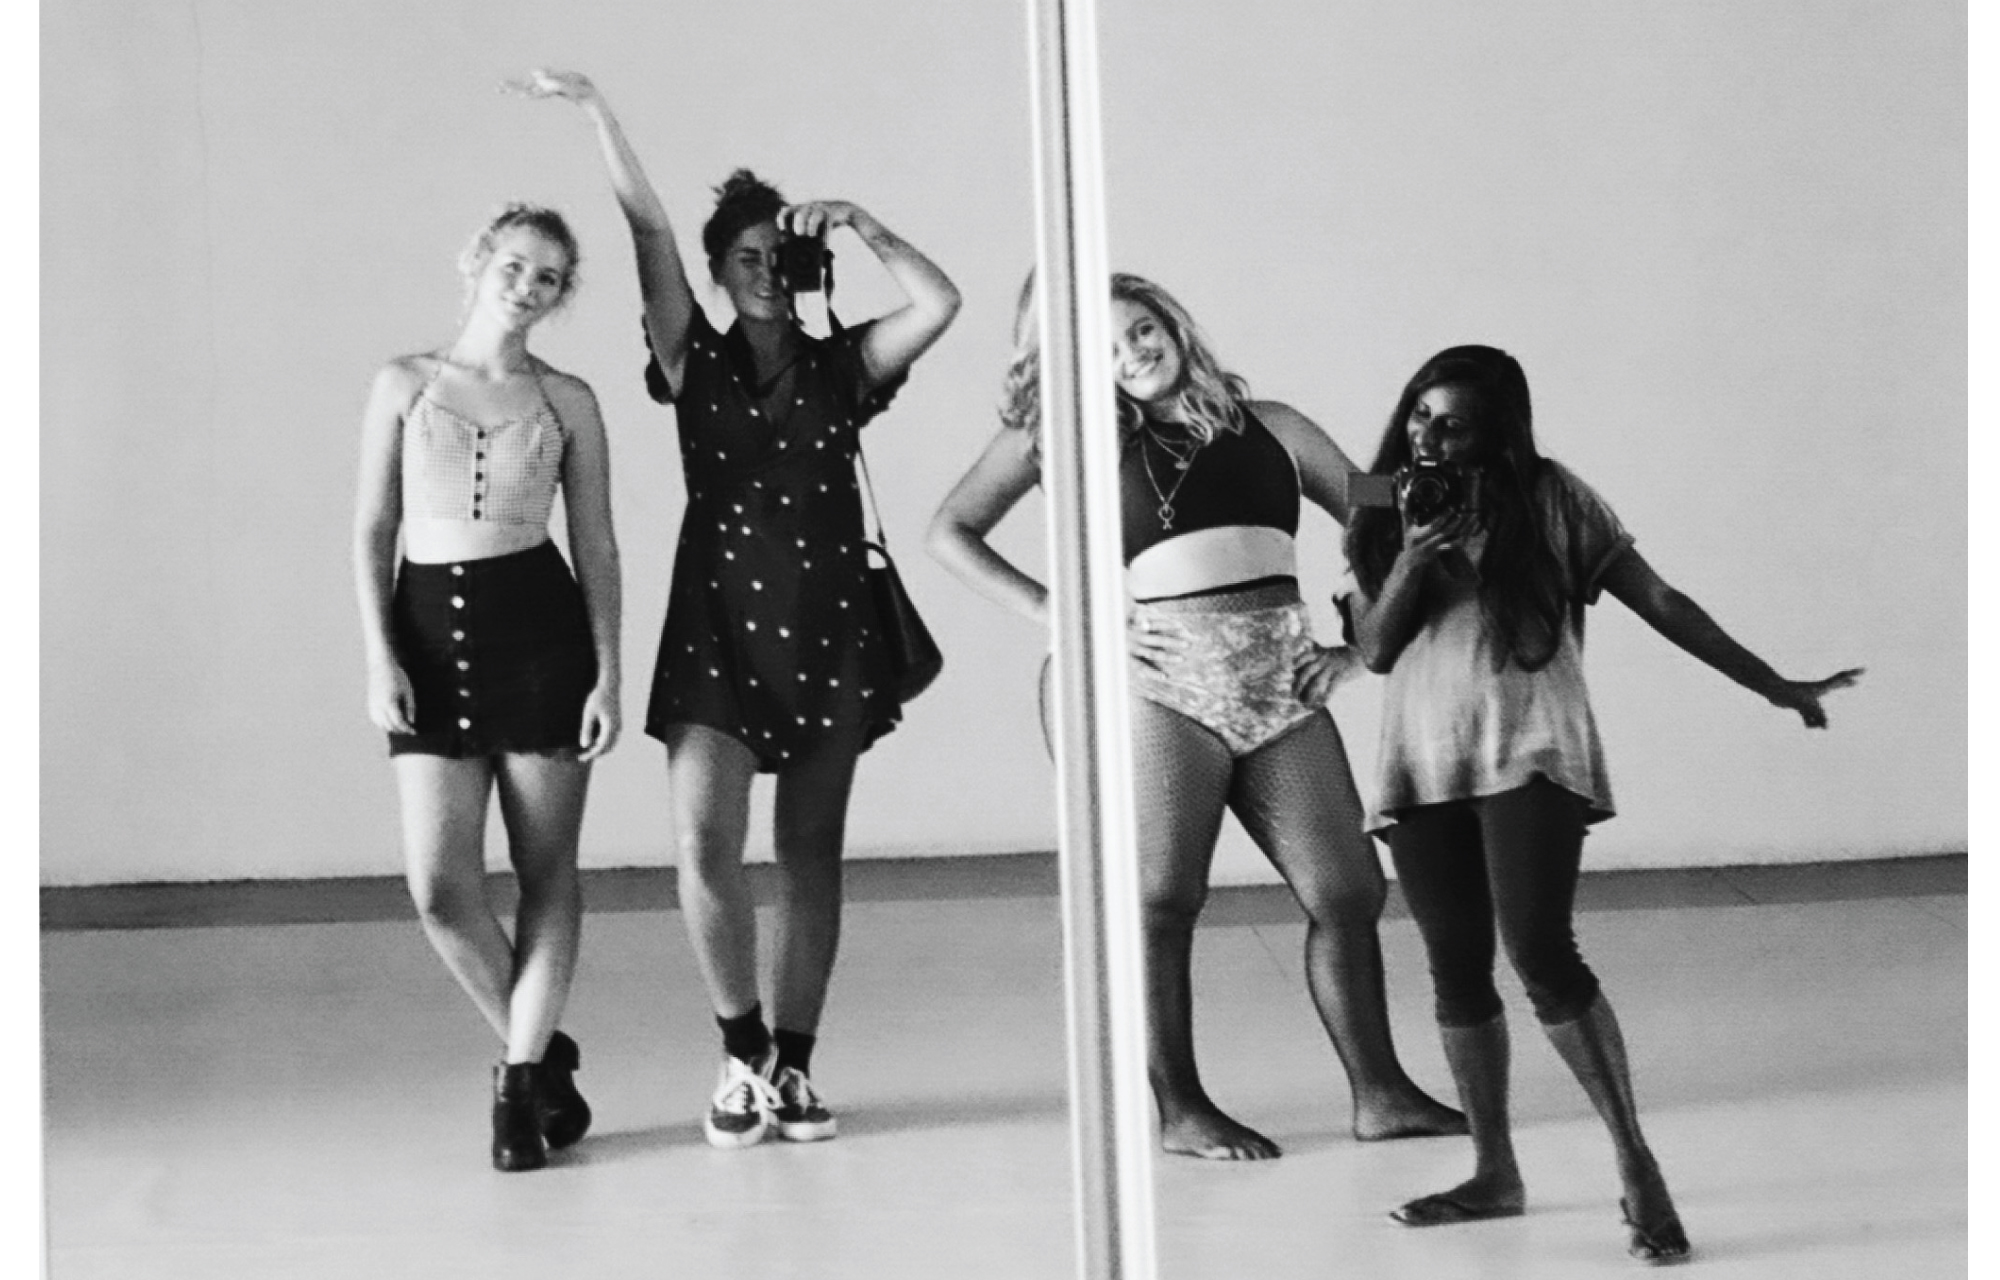 Kyla-Blacksmith-K-Dizzle-Hip-Hop-Jam-That's-My-Jam-Byron-Bay-by-Liar-the-Label-Dance-dream-team.jpg